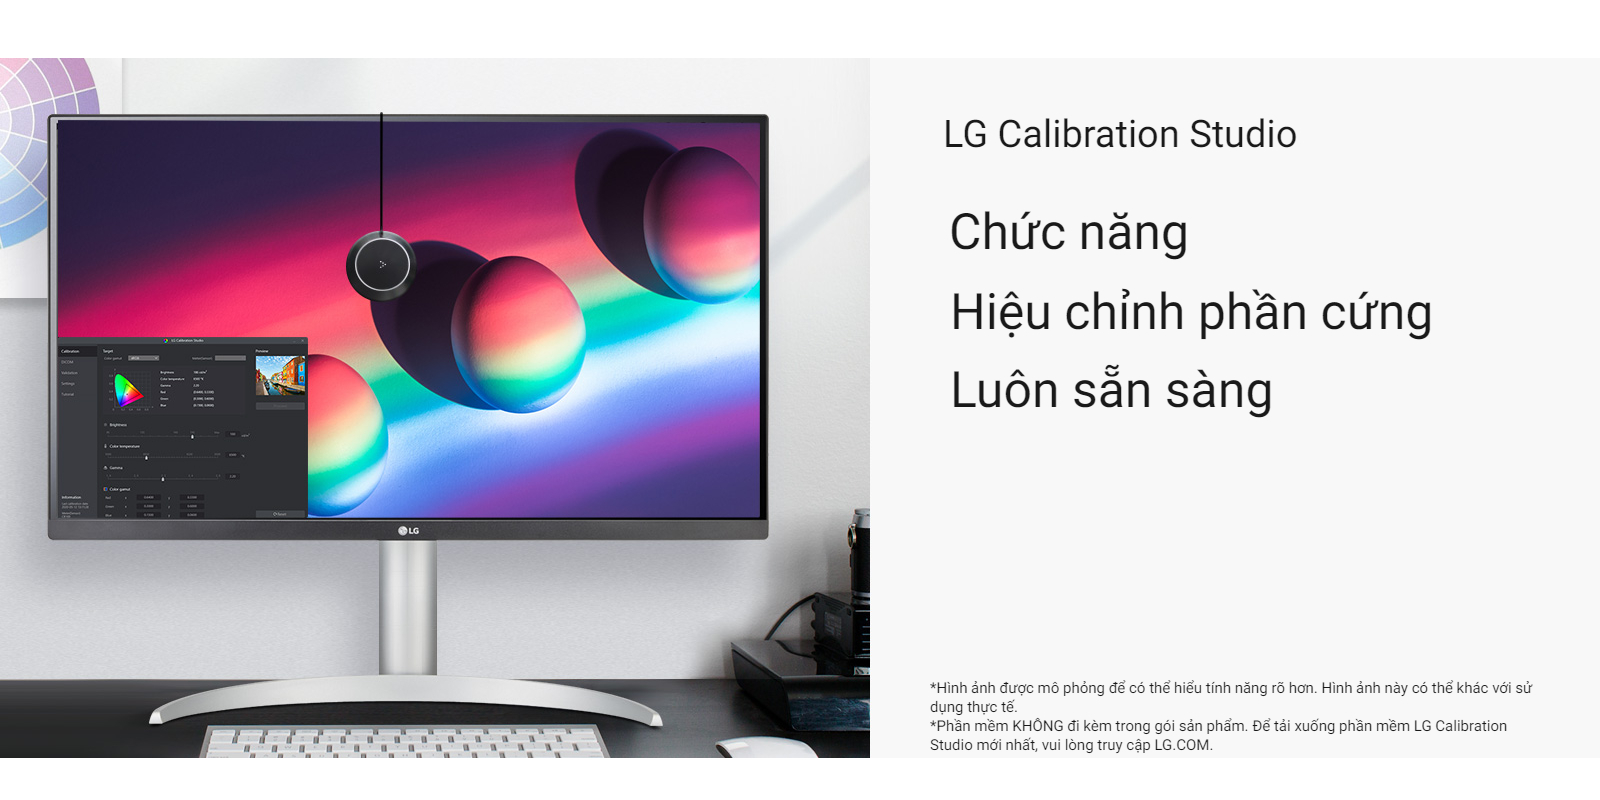 LG Calibration Studio